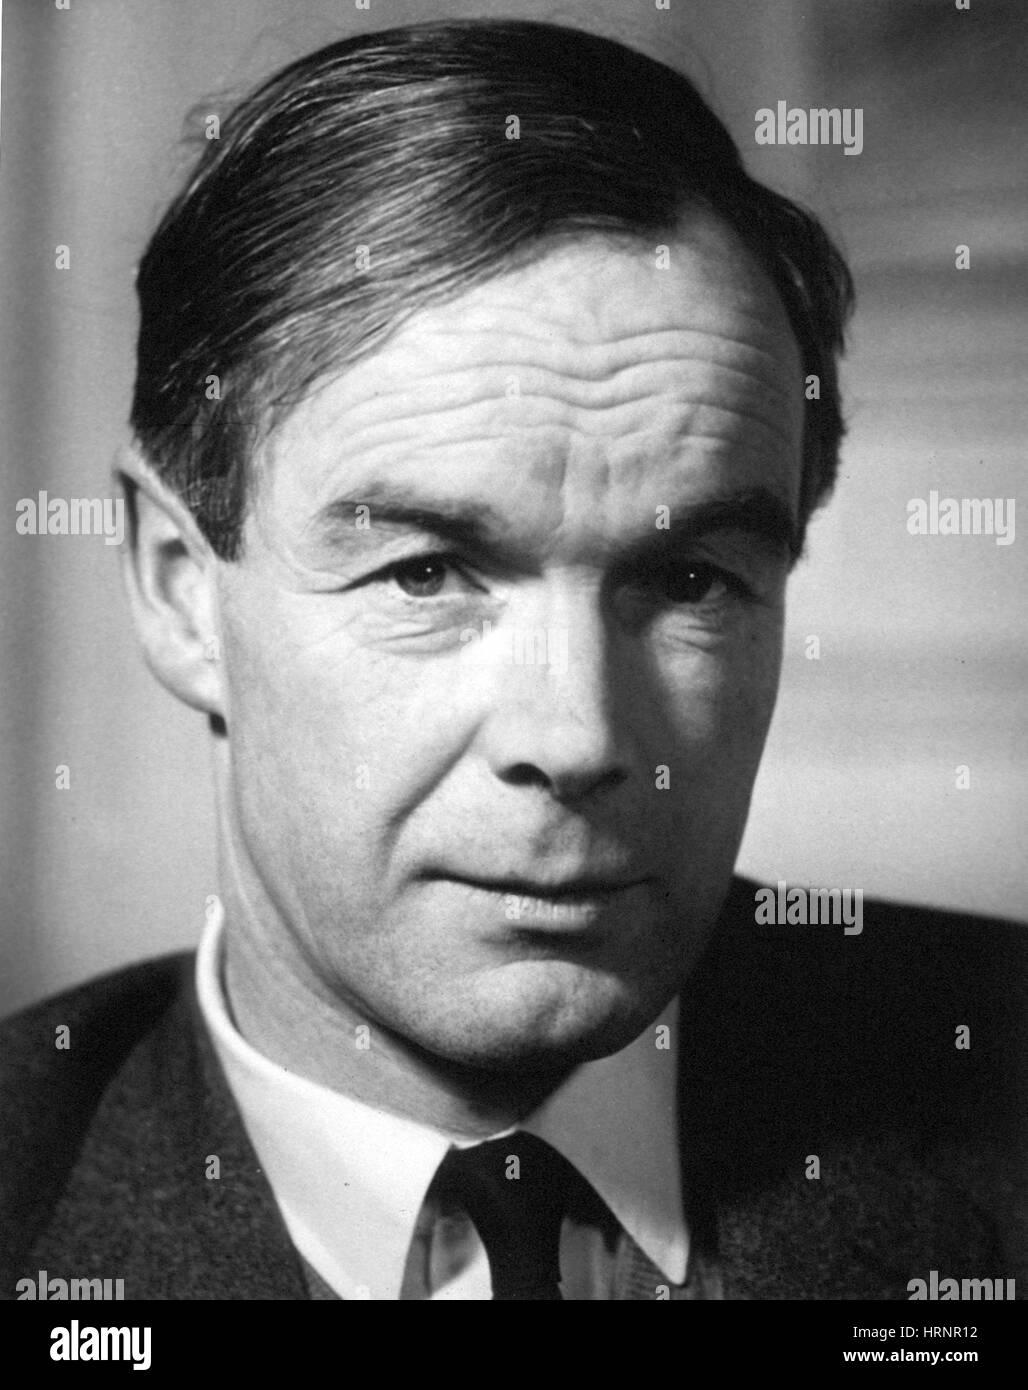 Alan Lloyd Hodgkin, English Physiologist and Biophysicist - Stock Image